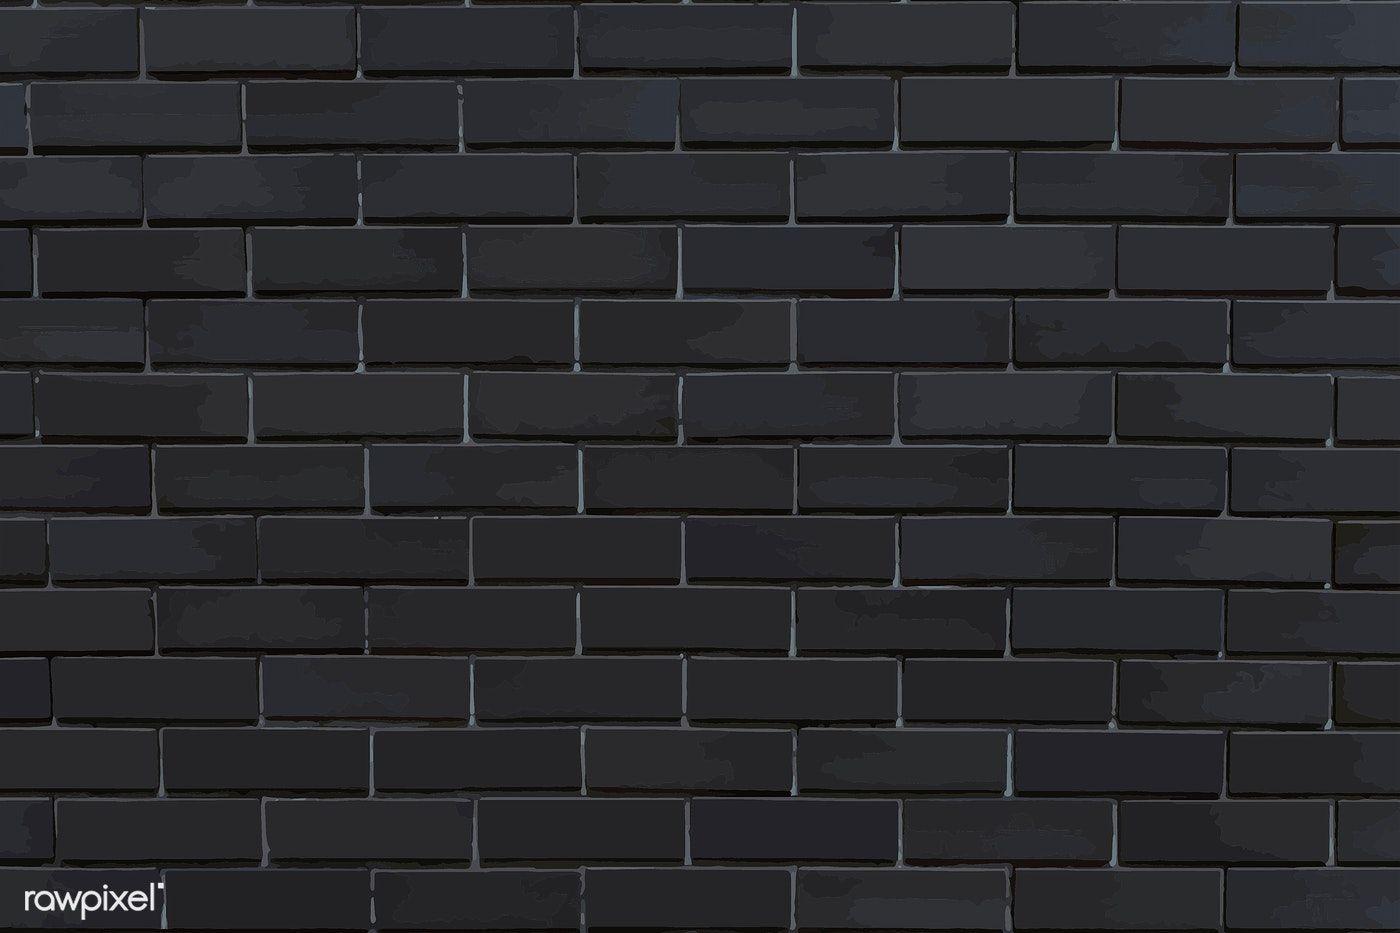 Dark Gray Brick Textured Background Vector Free Image By Rawpixel Com Niwat Brick Texture Texture Background Hd Textured Background